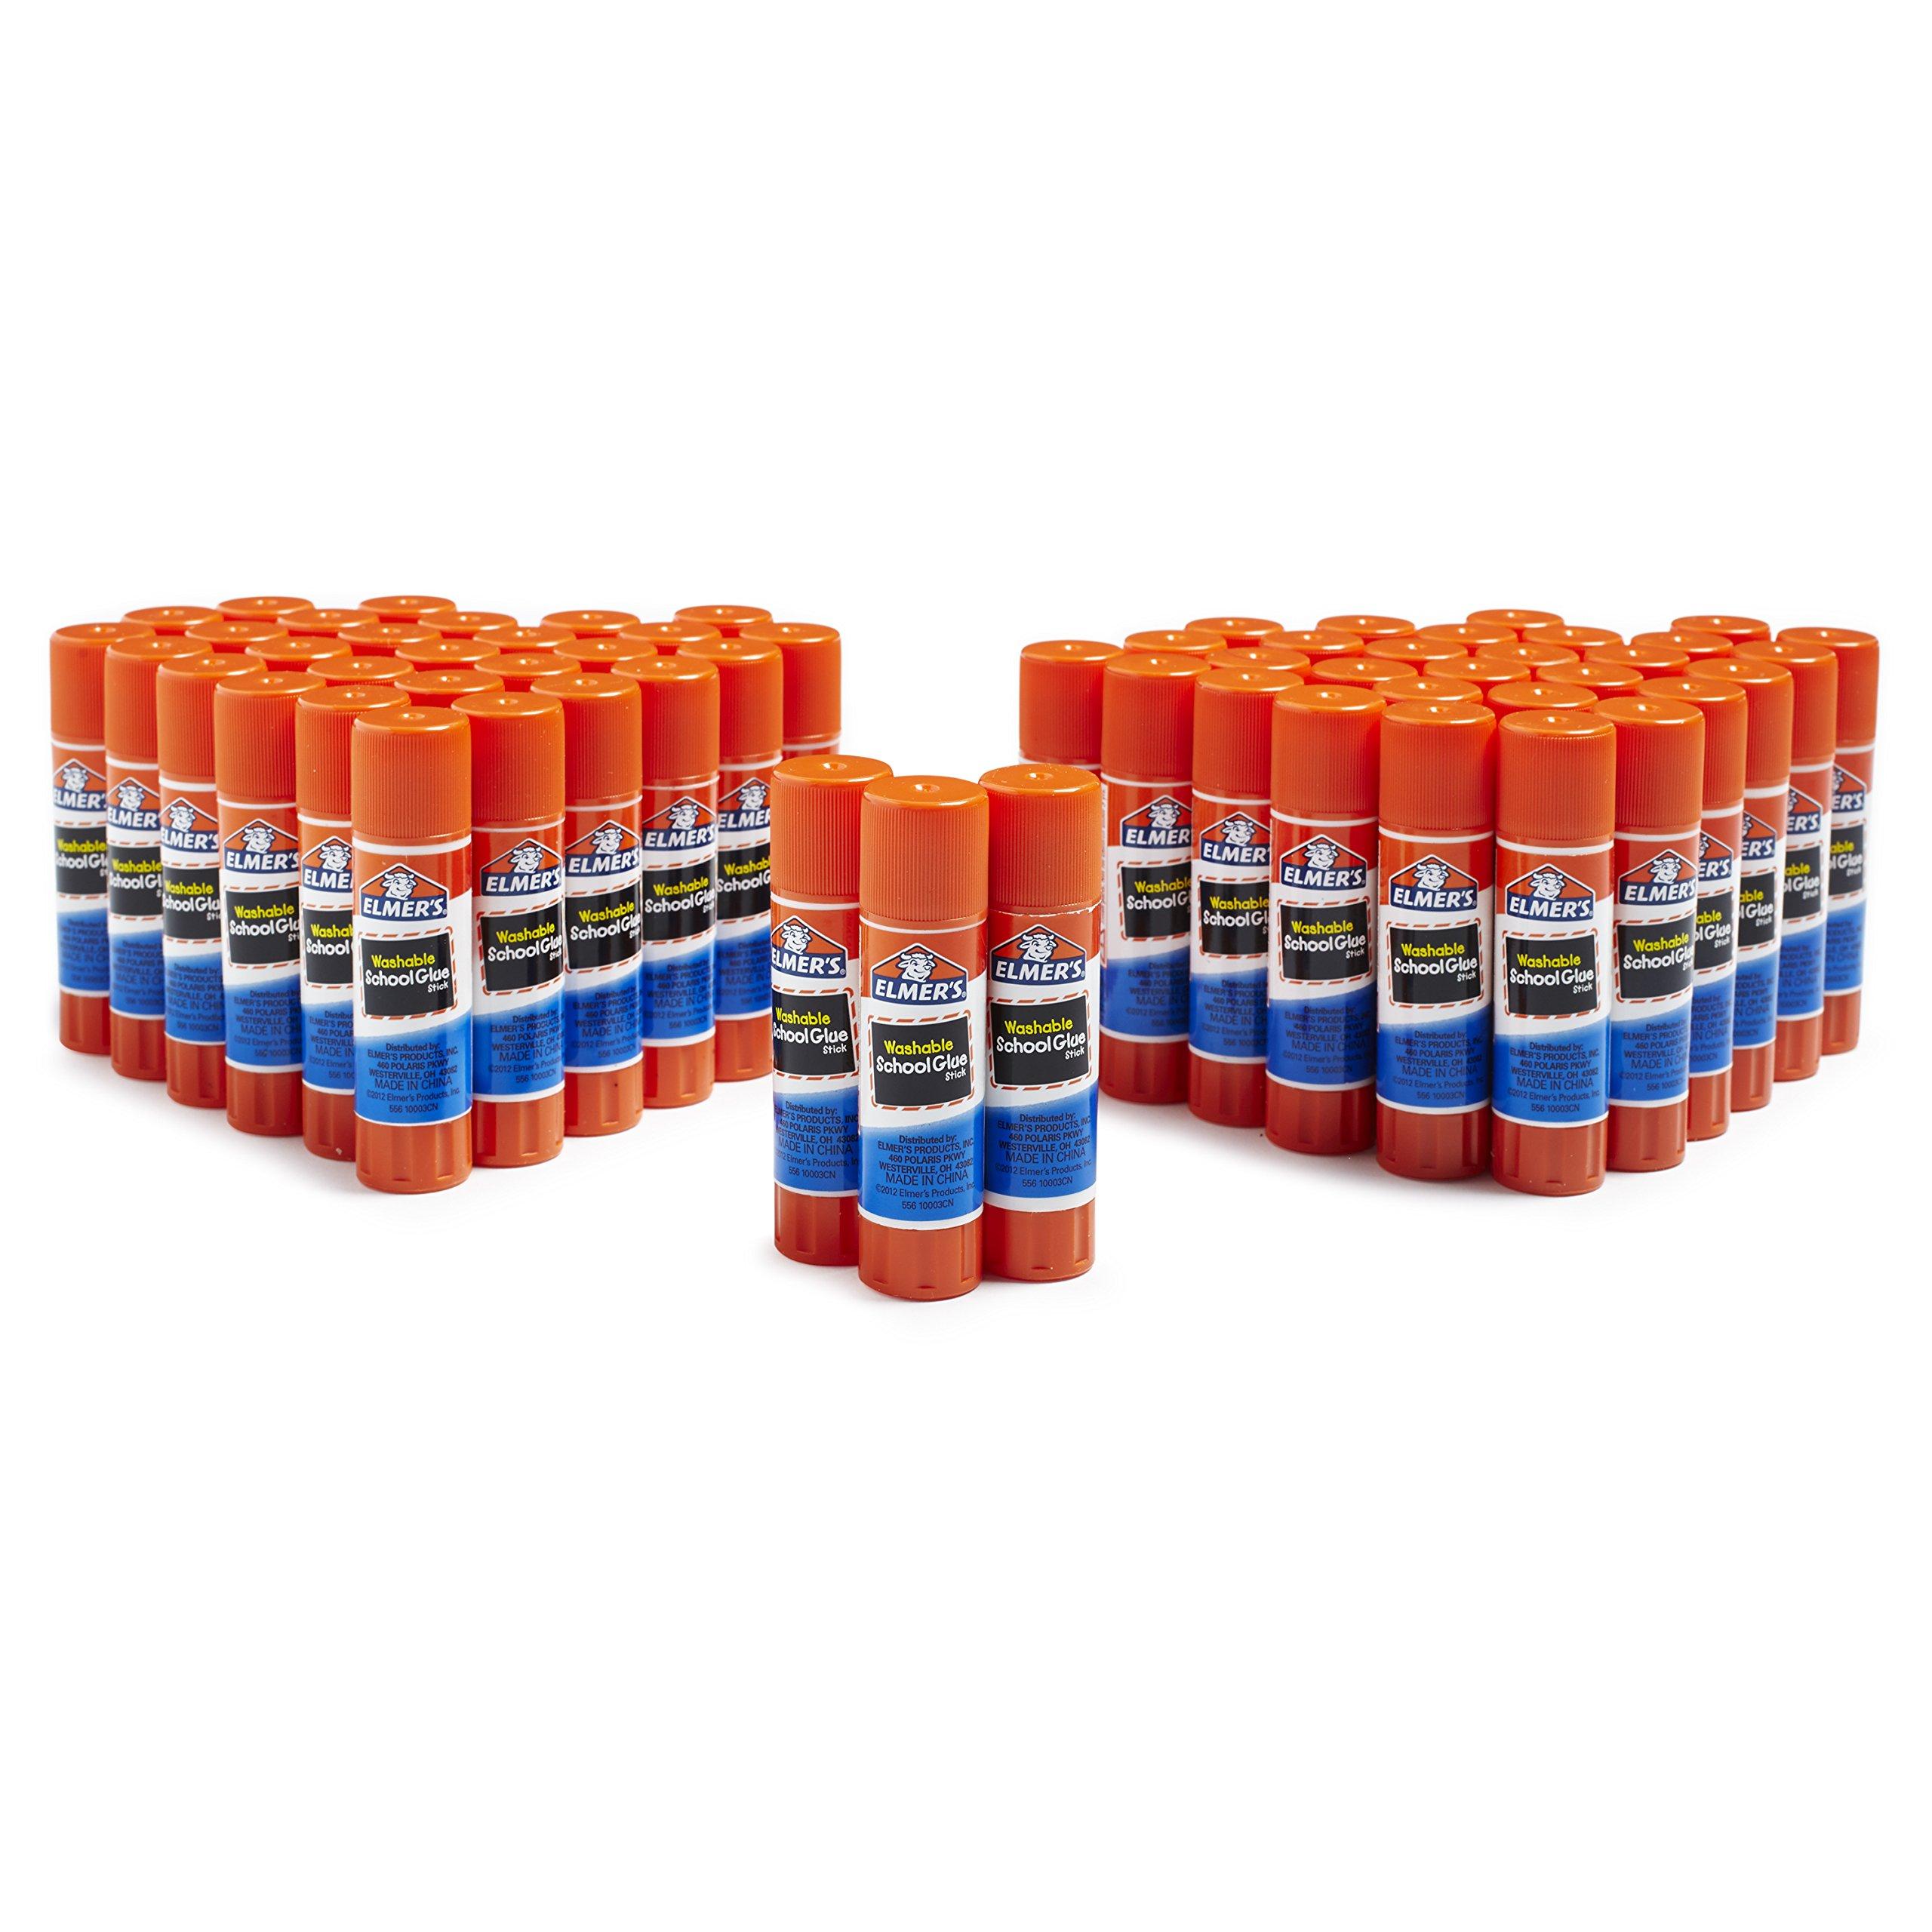 Elmer's All Purpose School Glue Sticks, Washable, 60 Pack, 0.24-ounce sticks by Elmer's (Image #4)